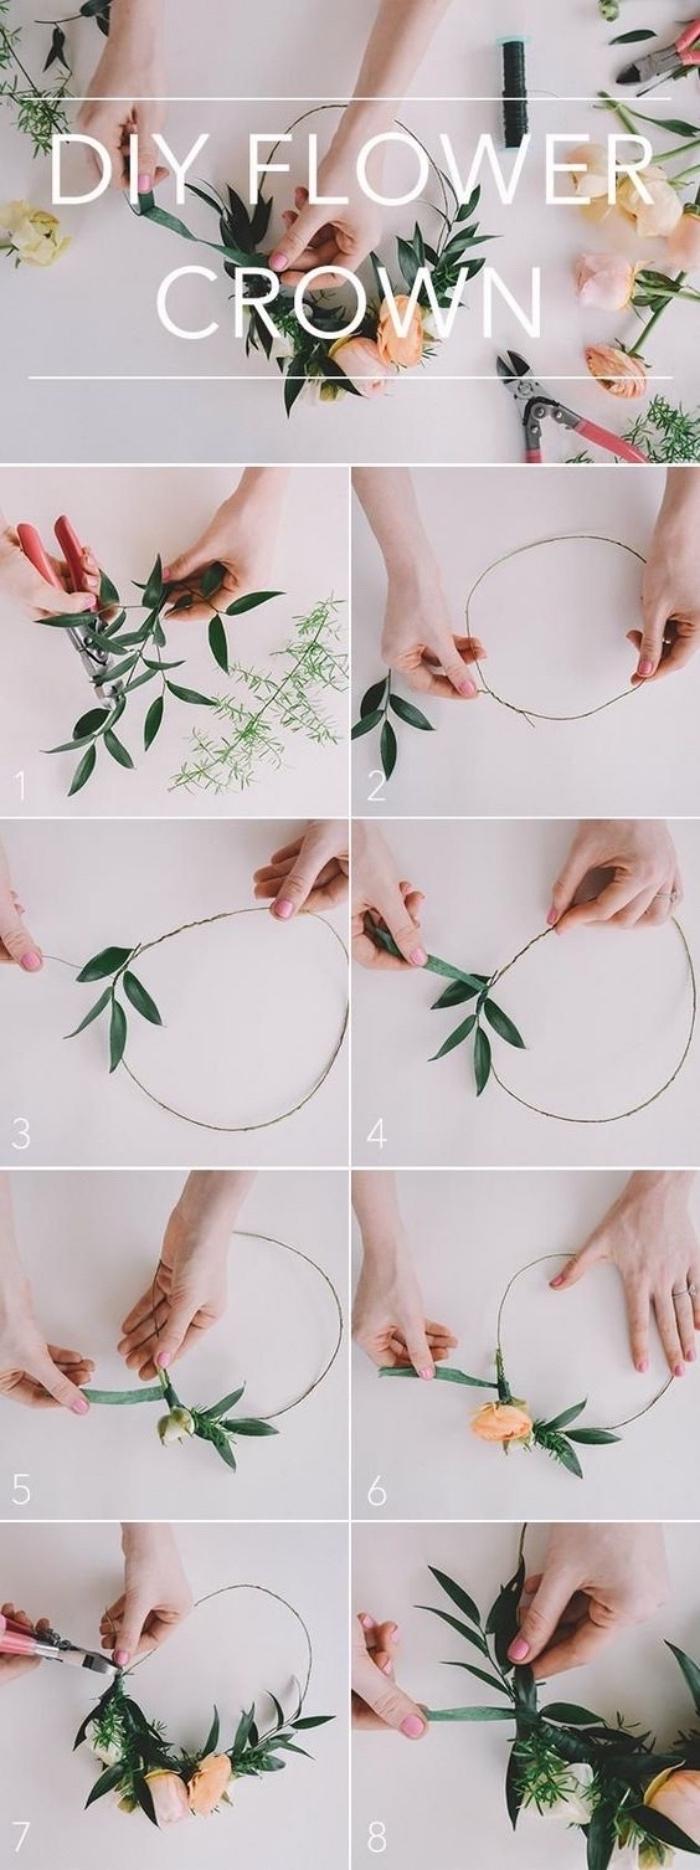 diy flower crown, cool diy projects, step by step tutorial